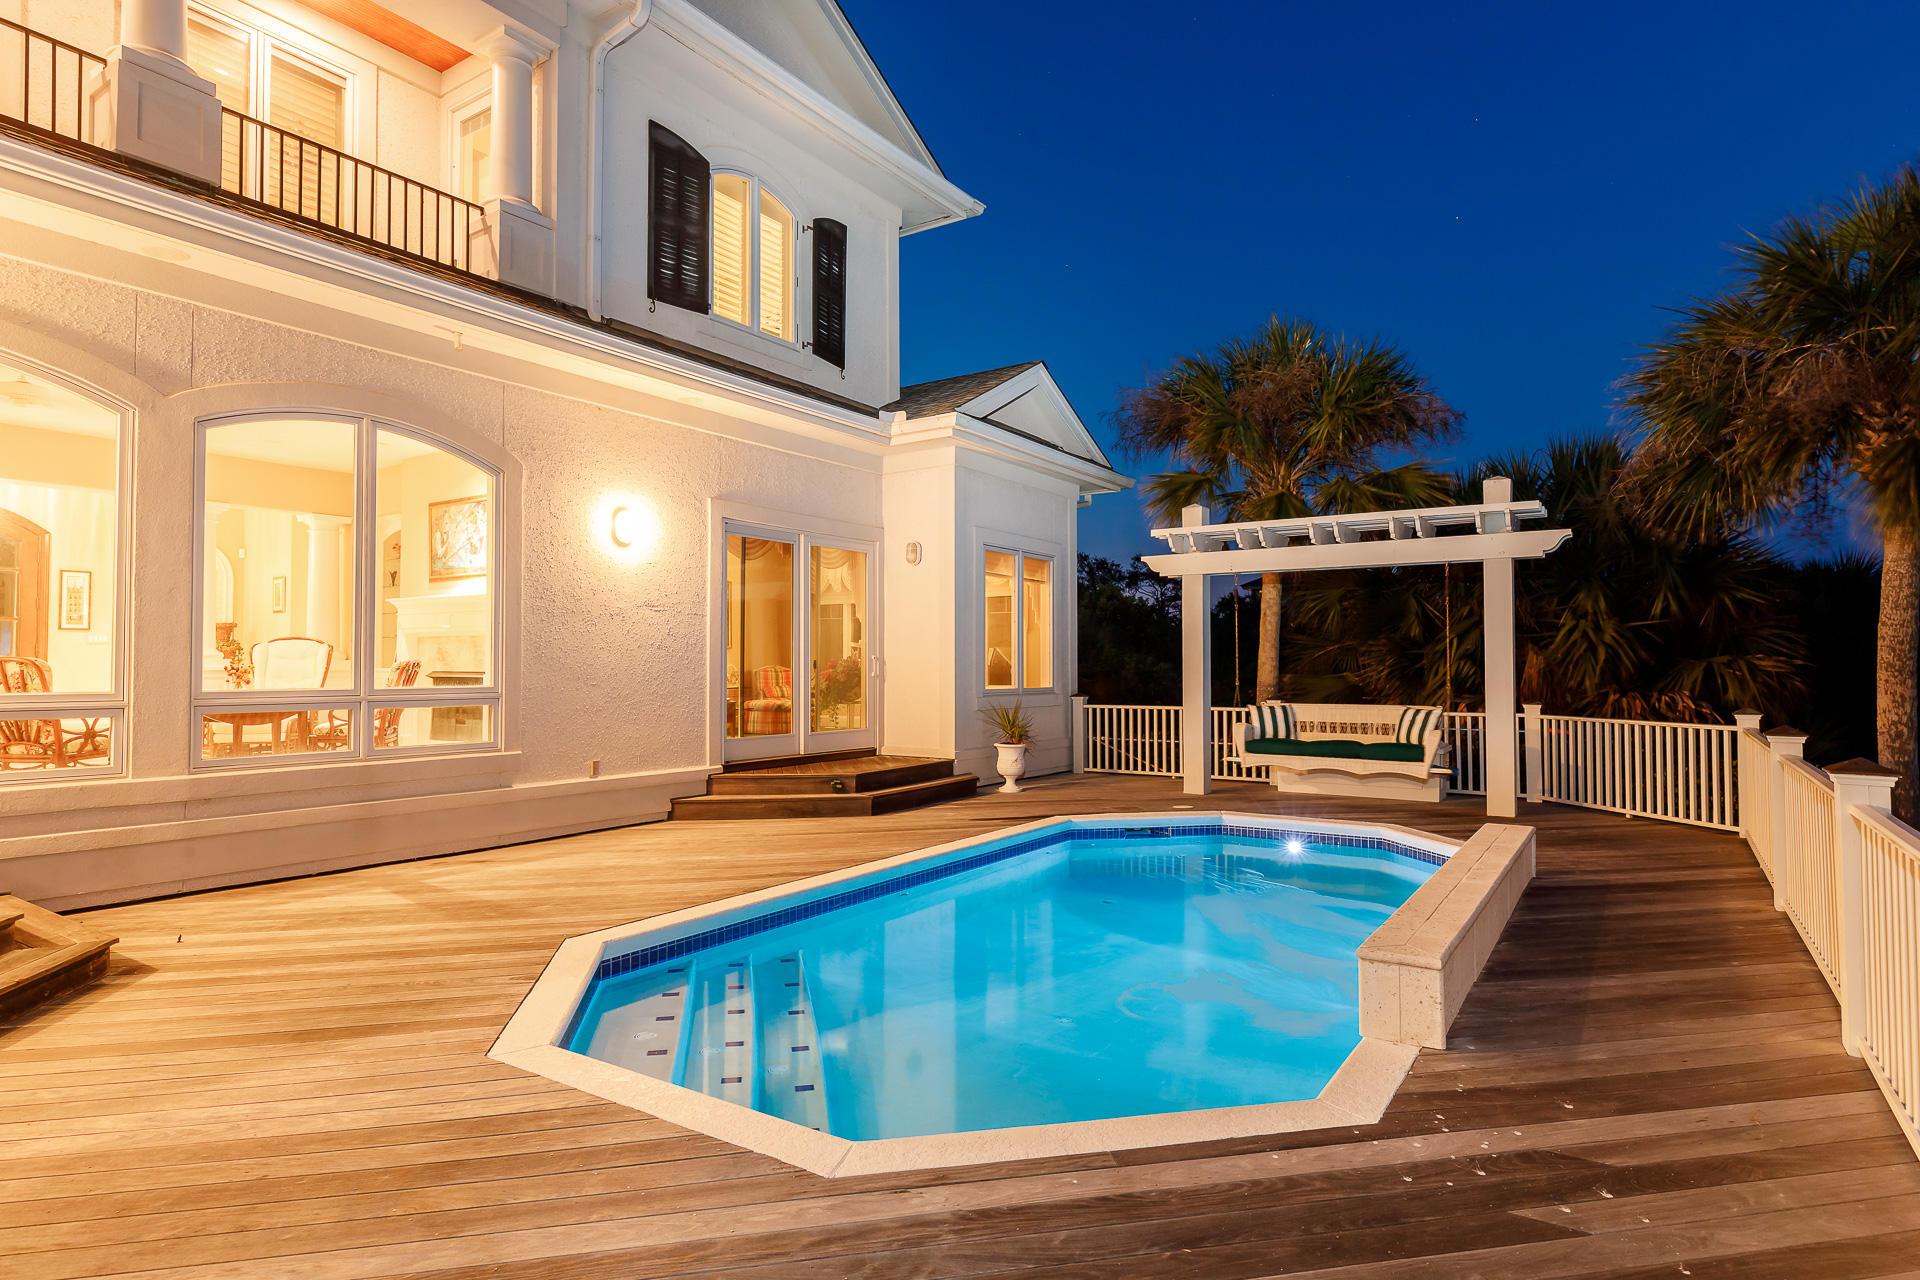 Seabrook Island Homes For Sale - 2216 Rolling Dune, Seabrook Island, SC - 14